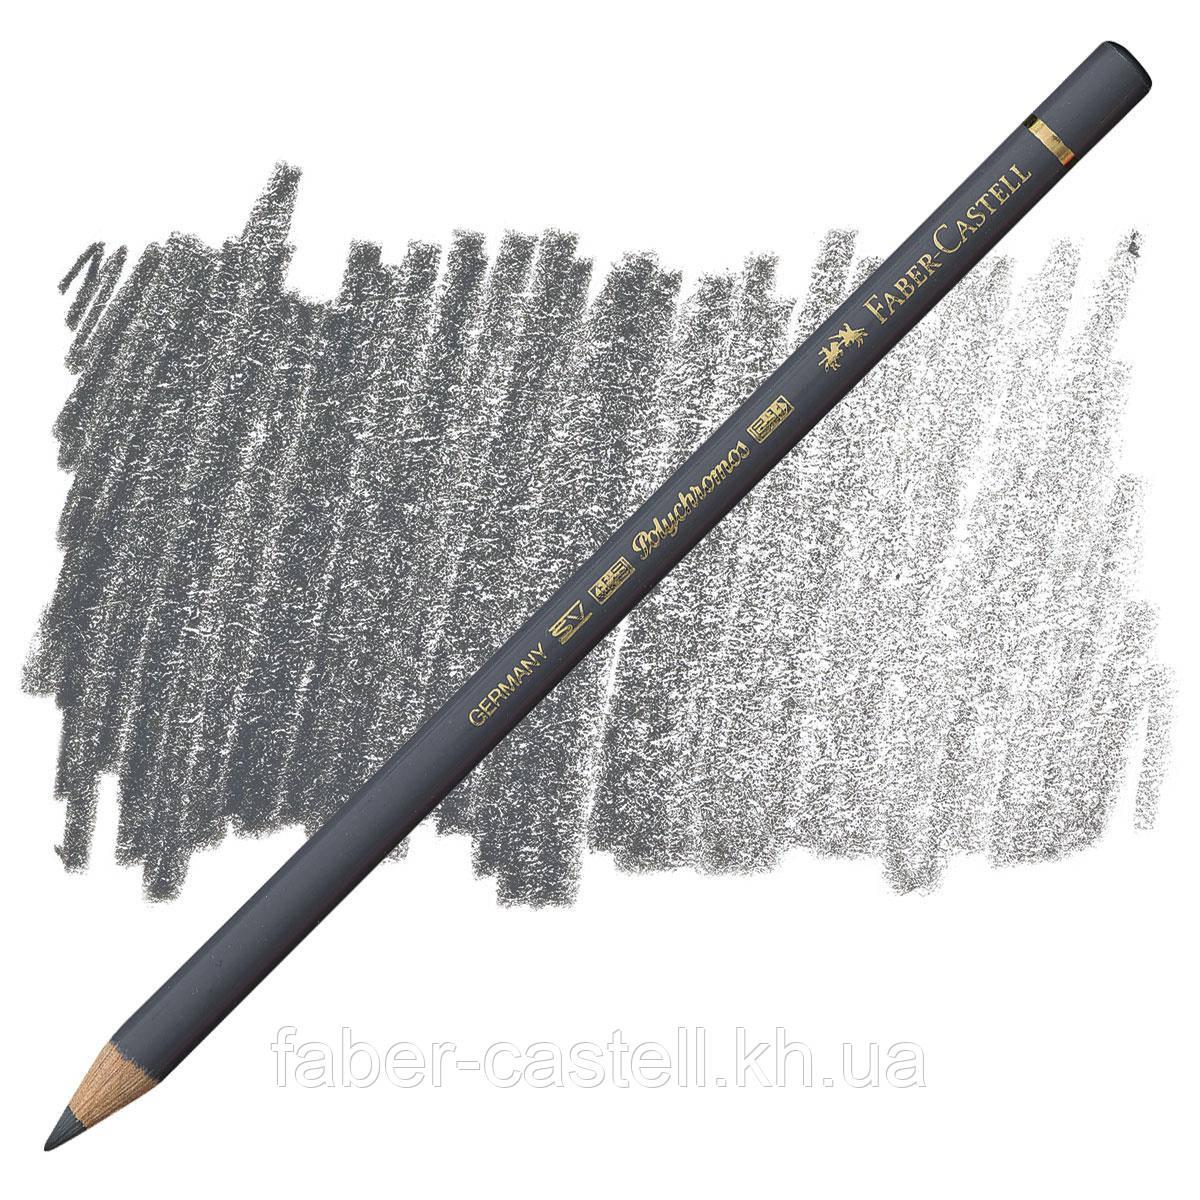 Карандаш цветной Faber-Castell POLYCHROMOS холодный серый V №234 (Cold Gray V), 110234